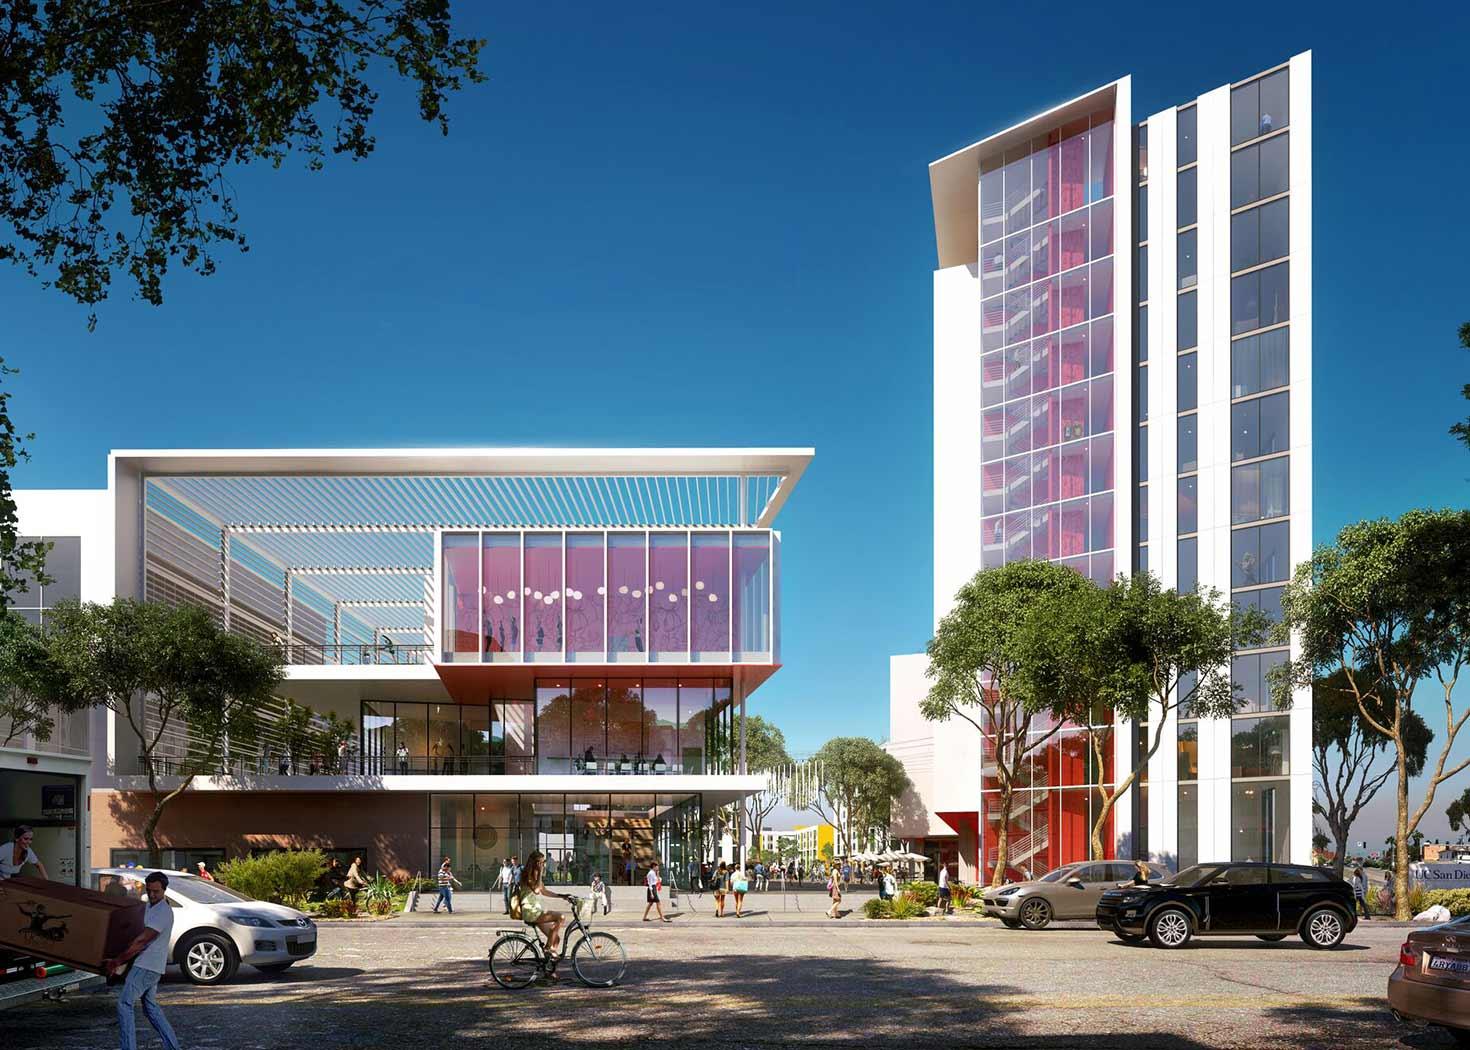 Ucsd Housing Calendar 2020-2021 Campus Transformation | UC San Diego's Strategic Plan